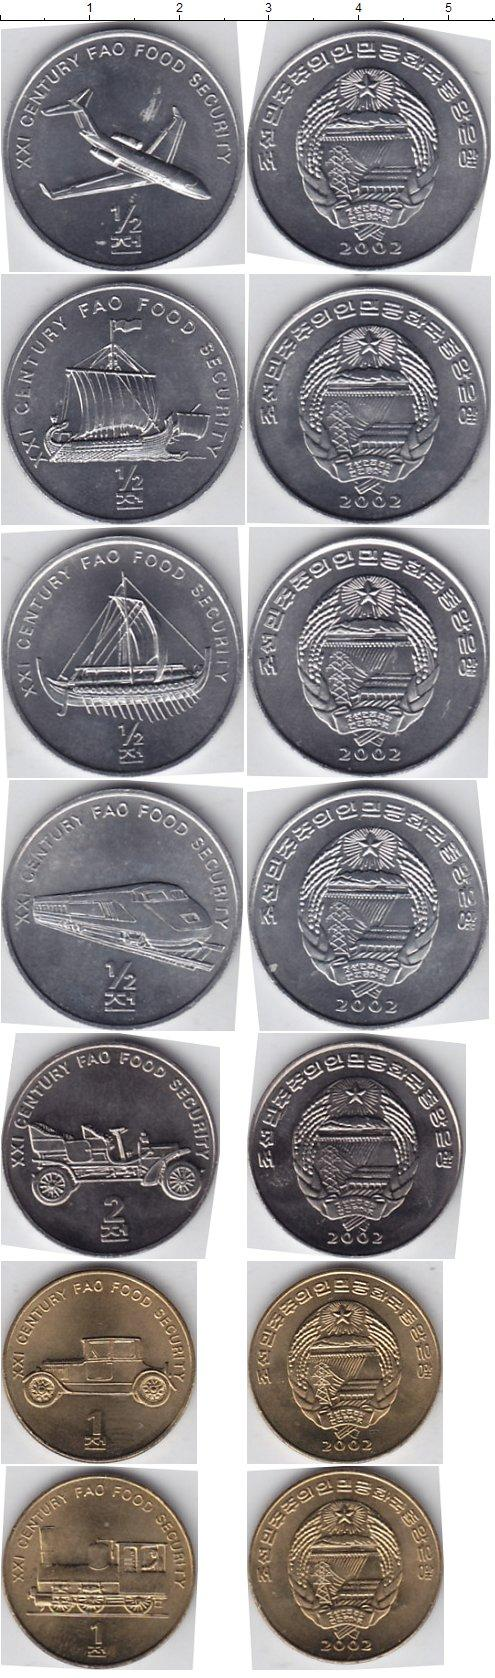 Каталог монет - Северная Корея Северная Корея 2002